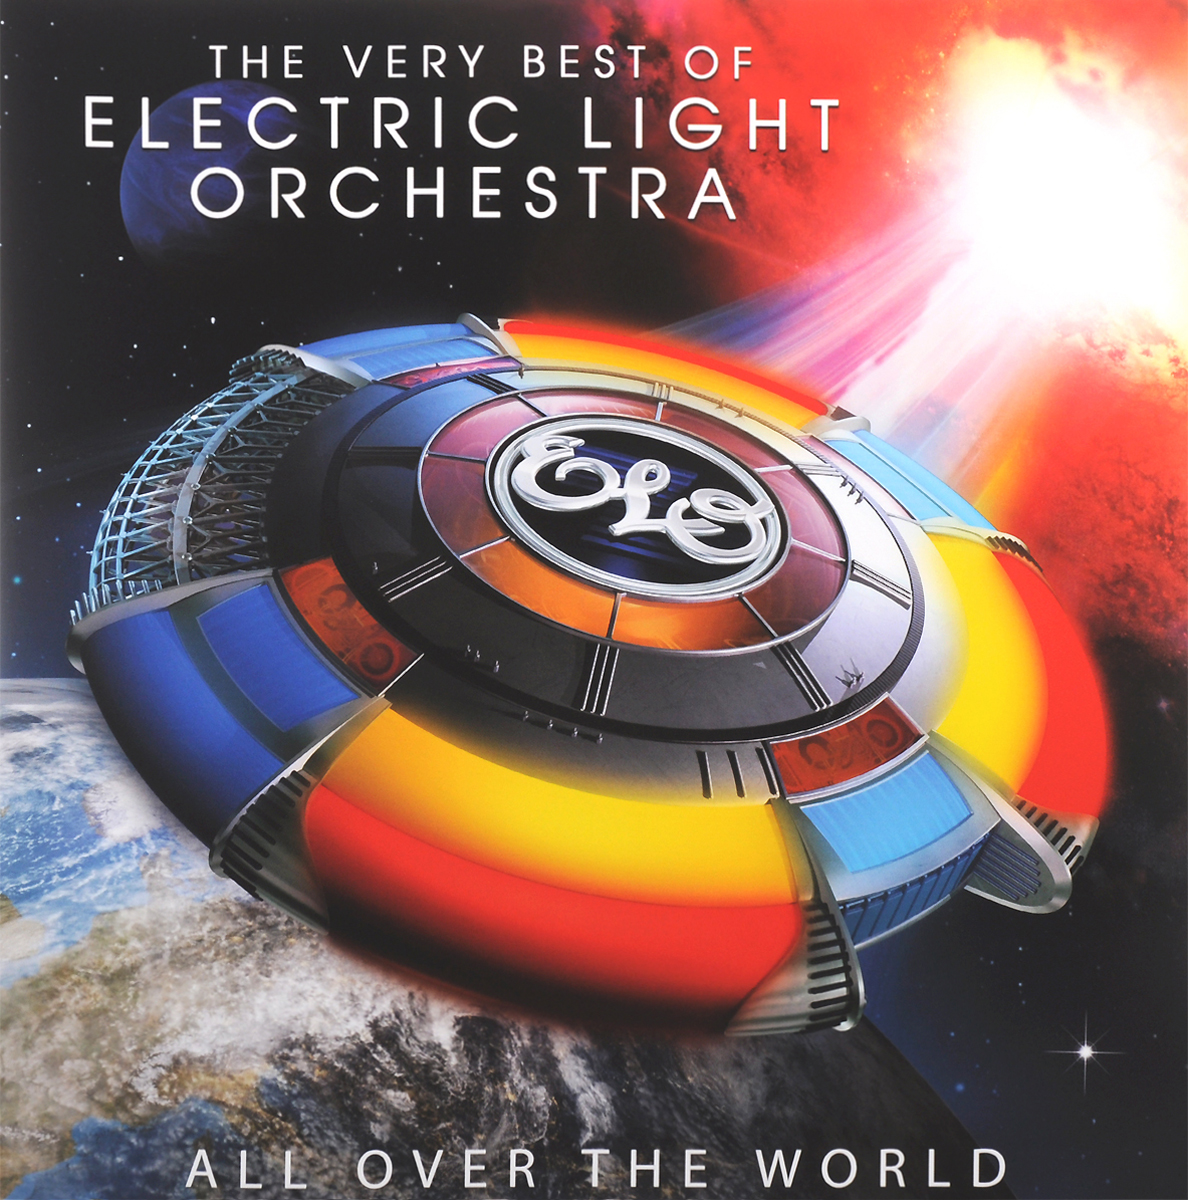 Electric Light Orchestra Electric Light Orchestra. The Very Best Of Electric Light Orchestra. All Over The World (2 LP) electric light orchestra electric light orchestra a new world record 2016 black vinyl version 180 gr